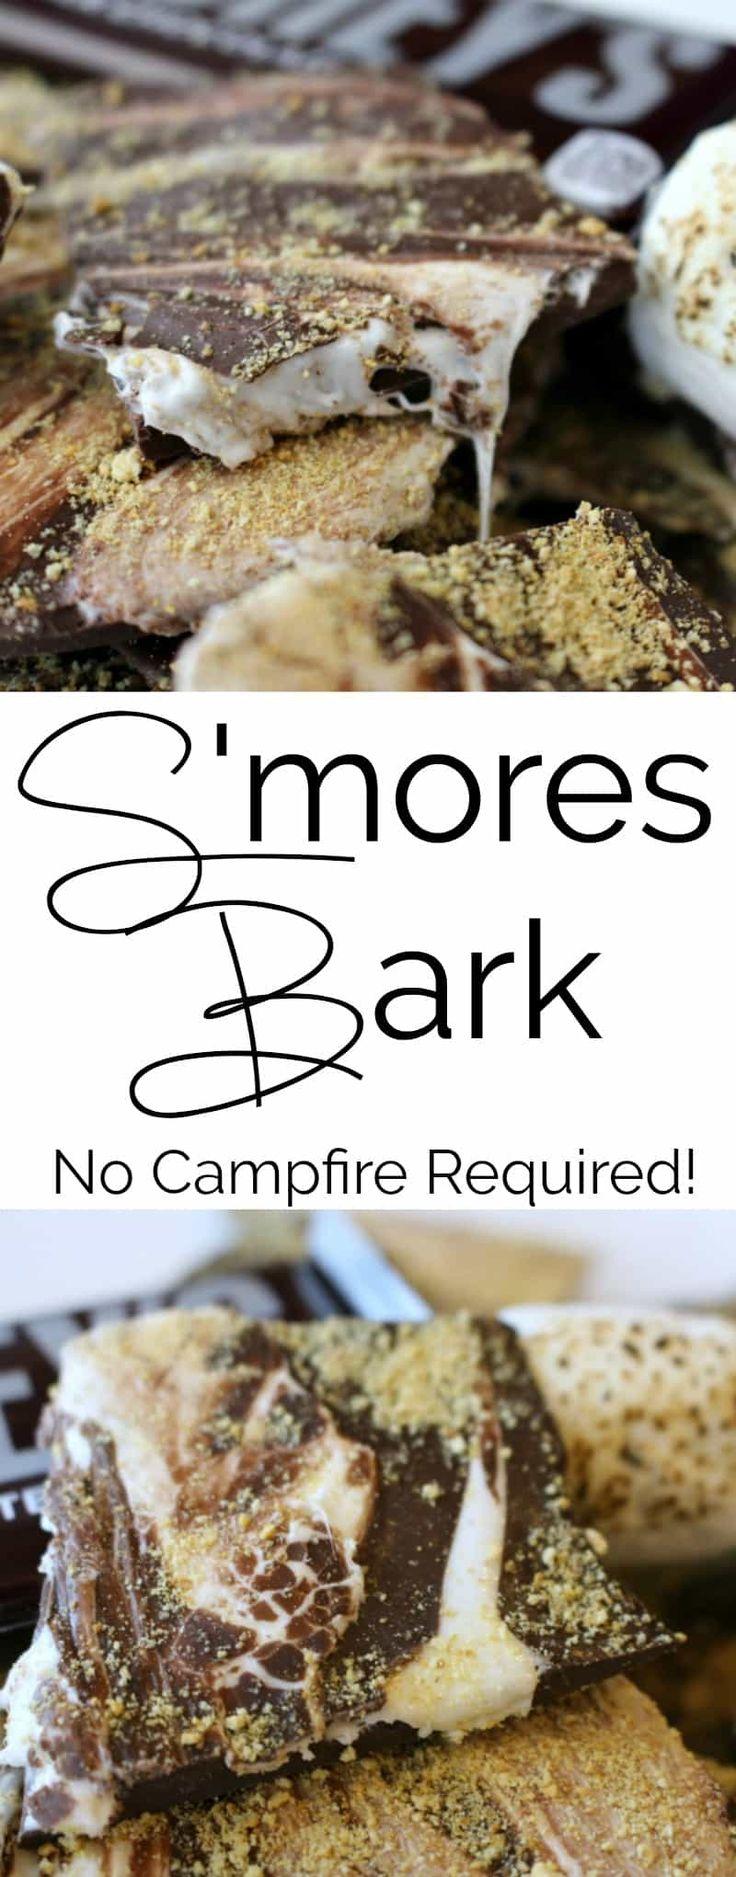 Need Recipe For White Chocolate Bark For Graham Crackers